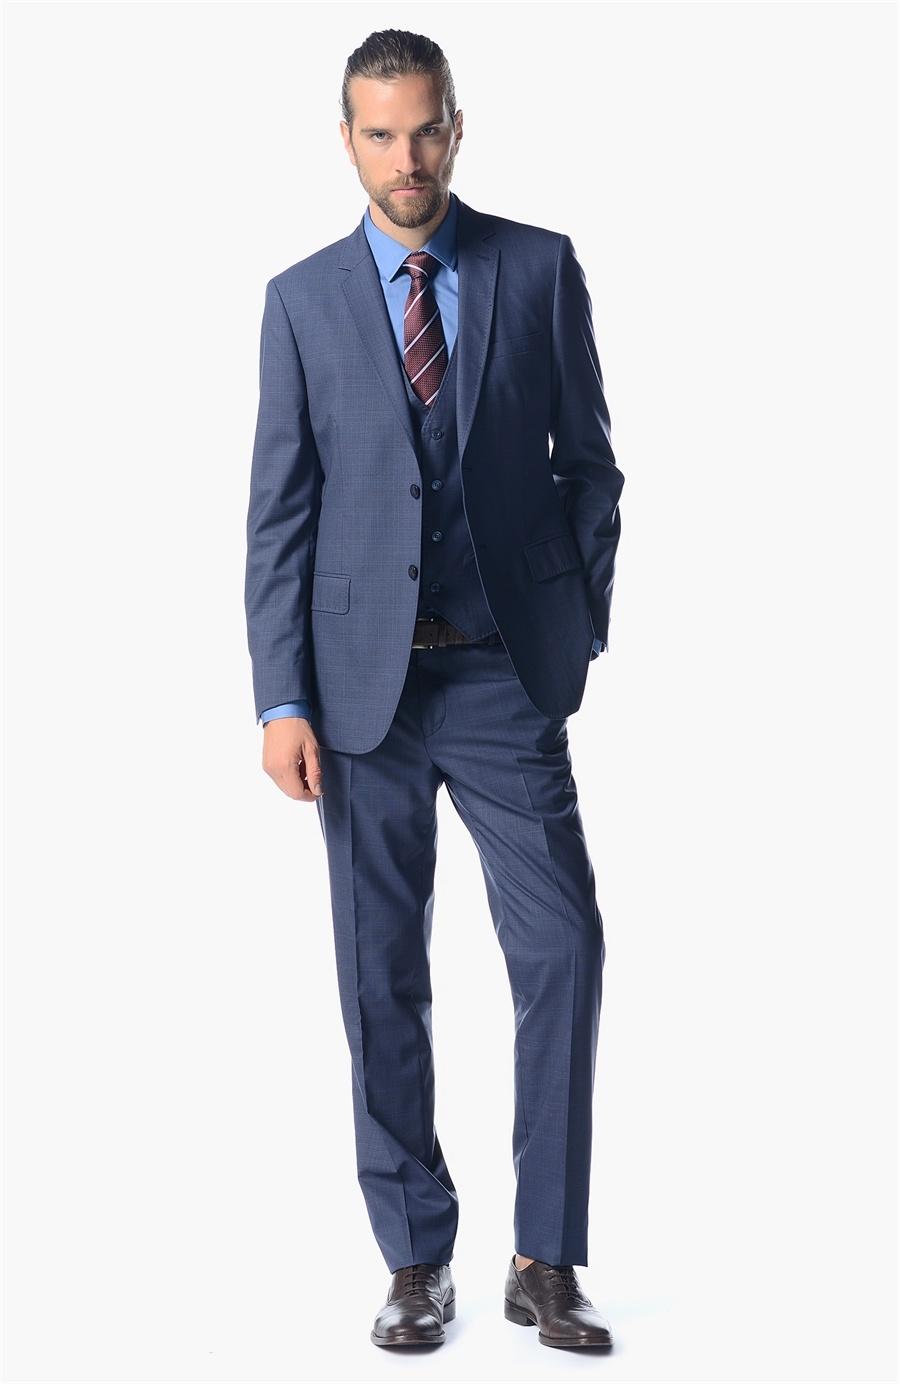 2019 Lacivert Yelekli Takım Elbise